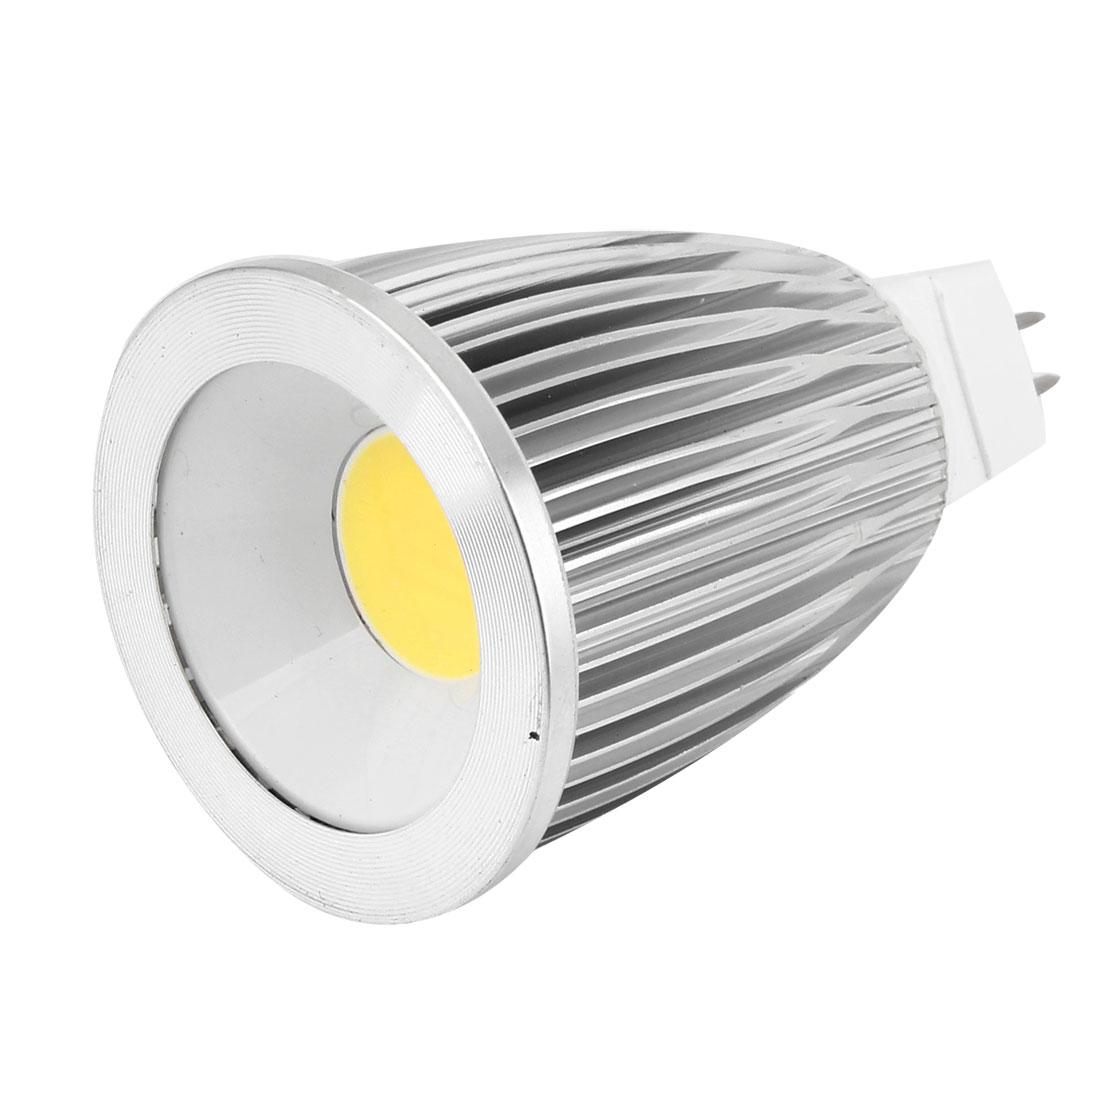 AC 12V 840-910LM 12W MR16 White Light COB LED Downlight Spotlight Lamp